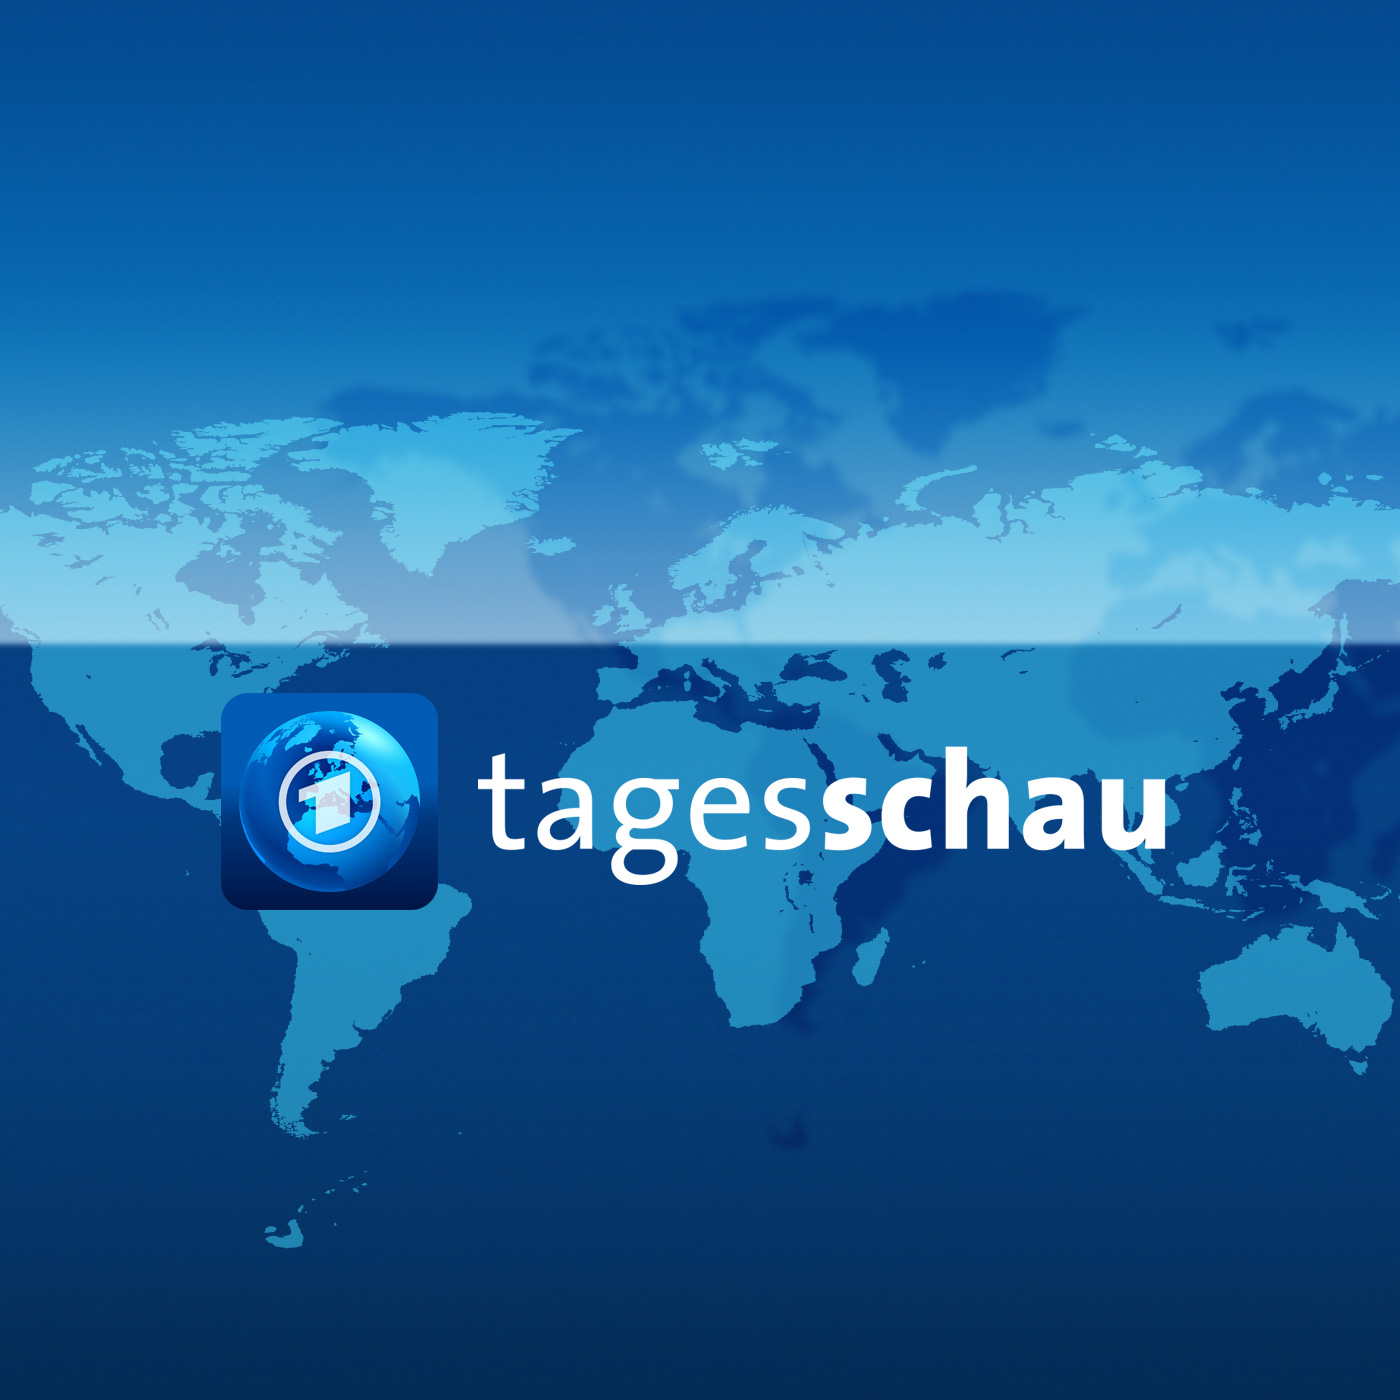 Tagesschau (960x544)